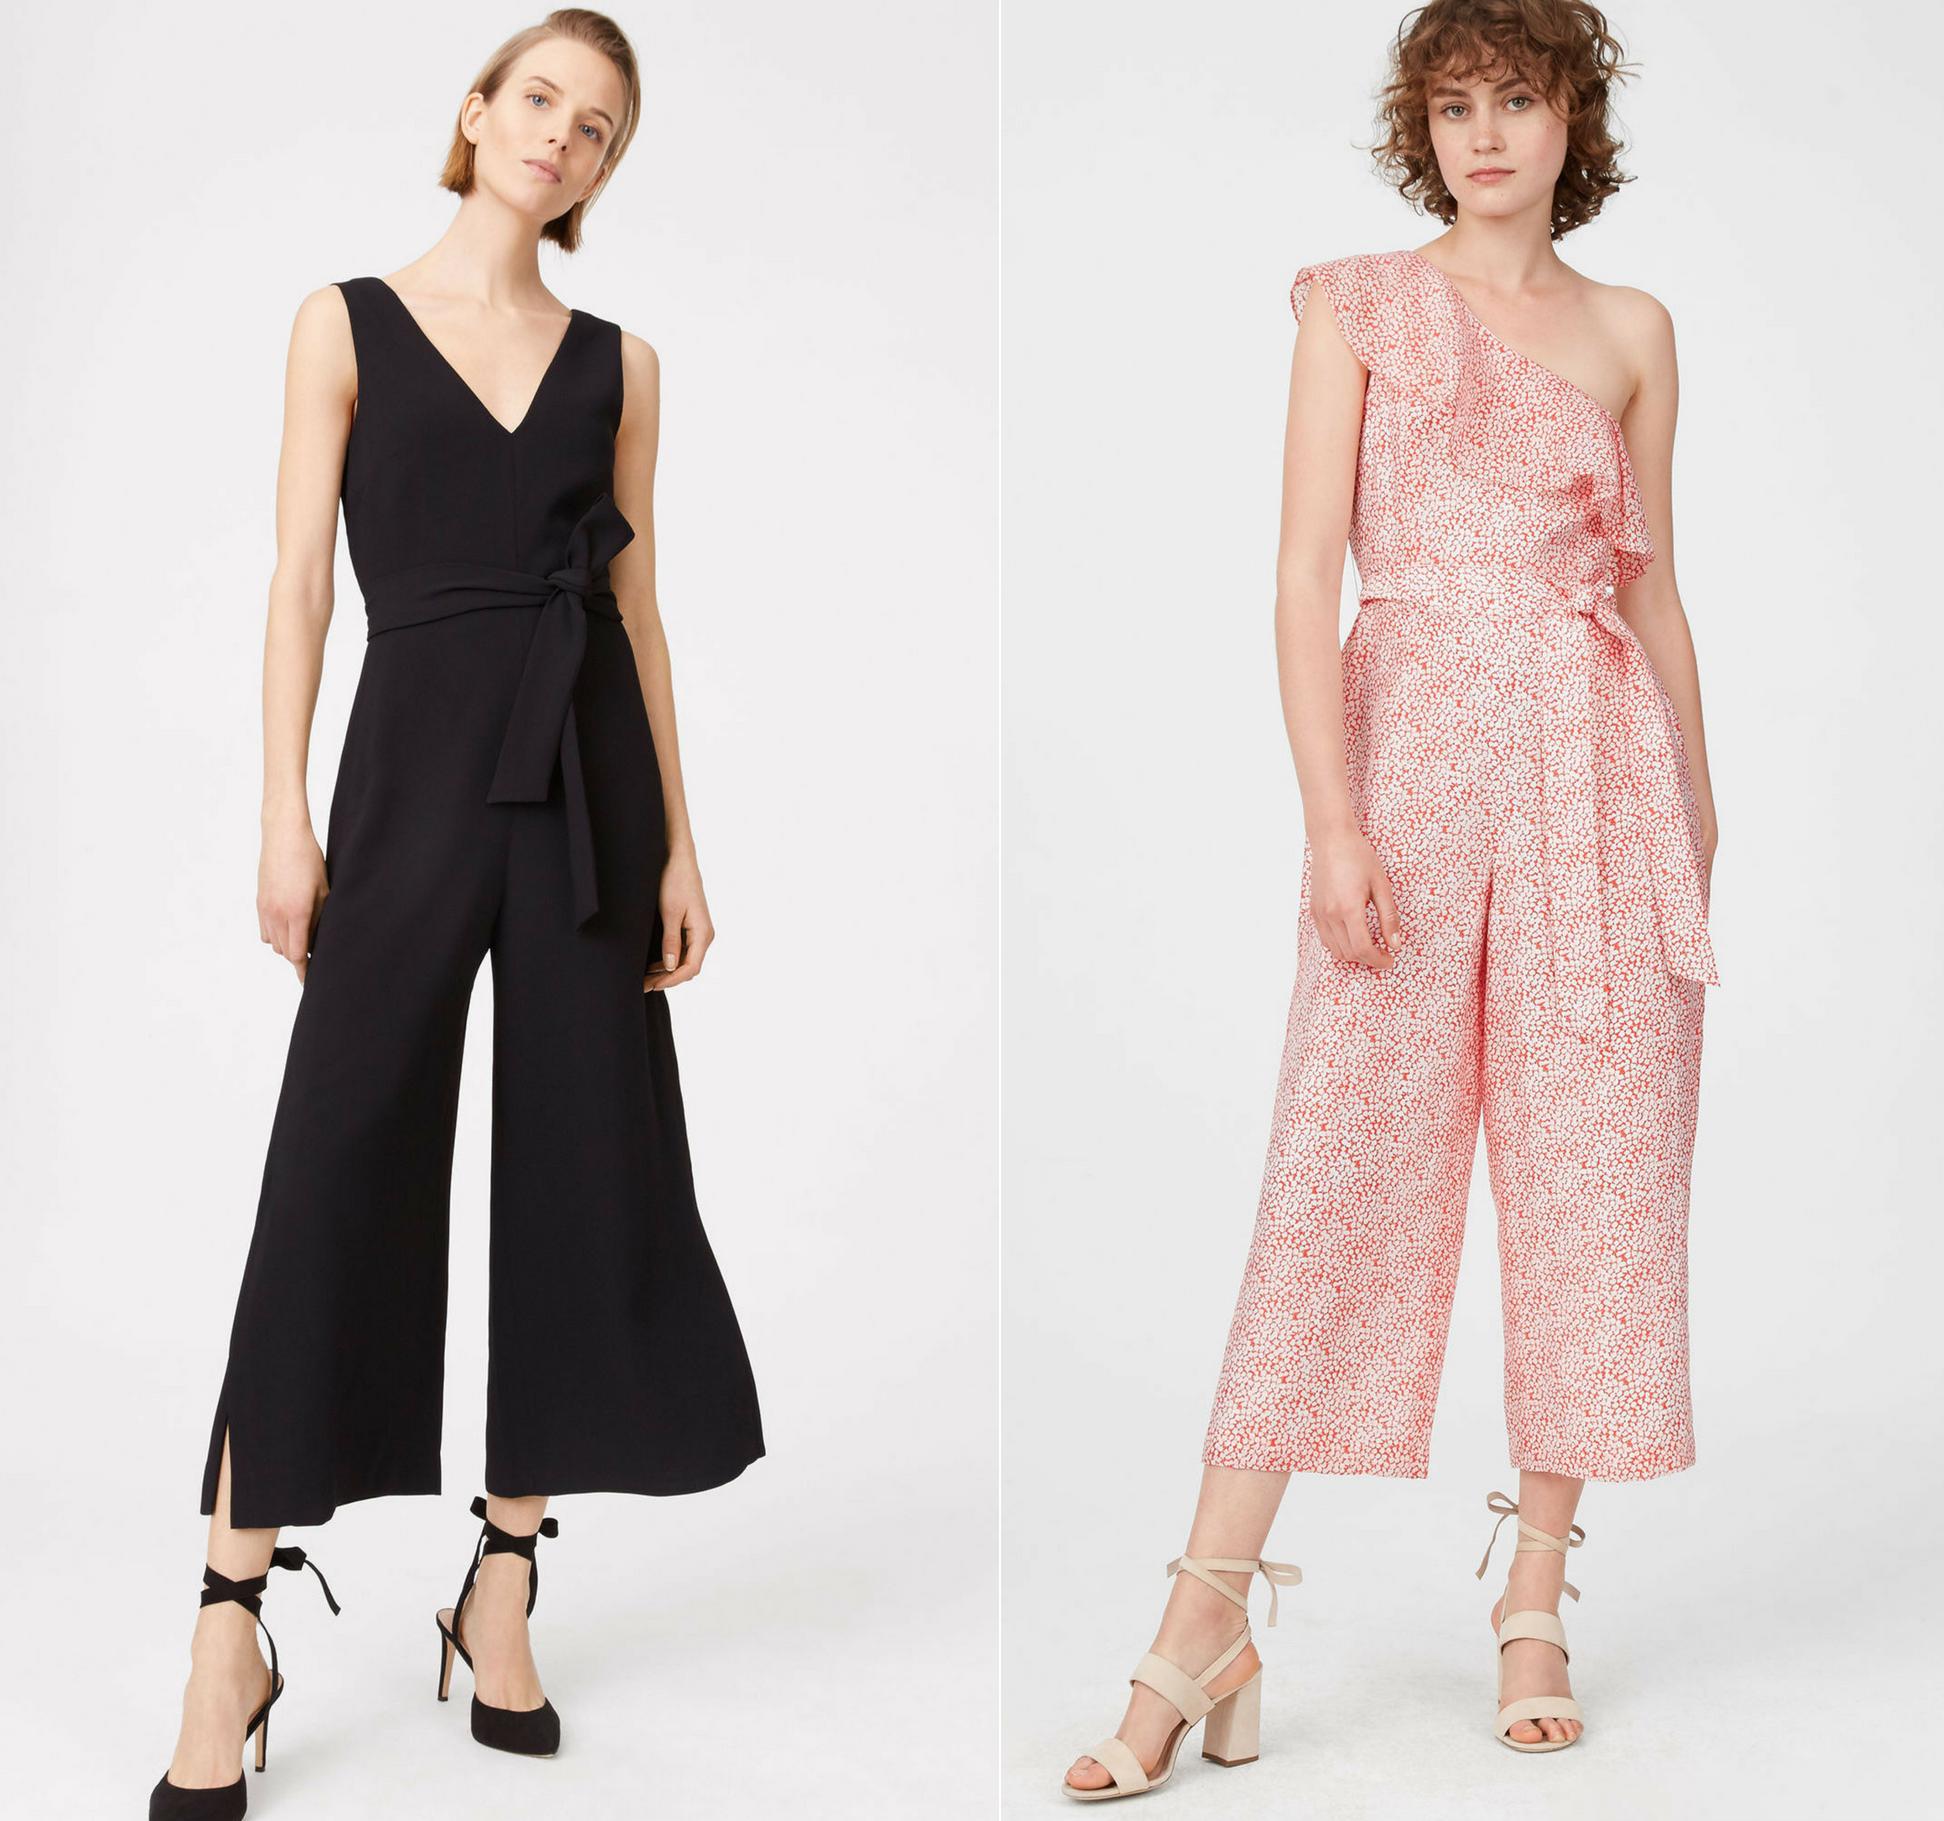 shop the look - Club Monaco- Akinya Jumpsuit (left) Lene Printed Jumpsuit (right)